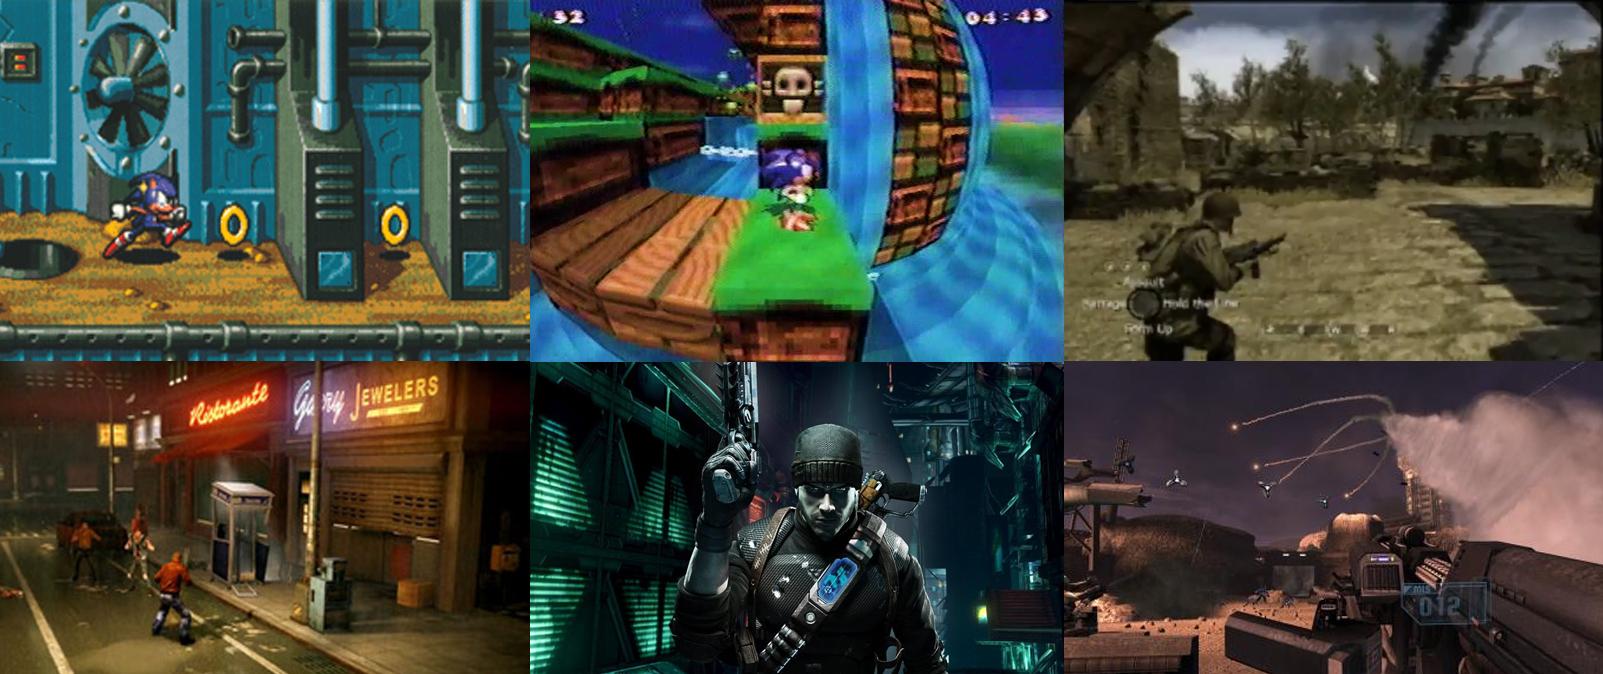 Sonic-16, Sonic X-treme, CoD: Vietnam, Streets of rage, Prey 2, Tiberium.